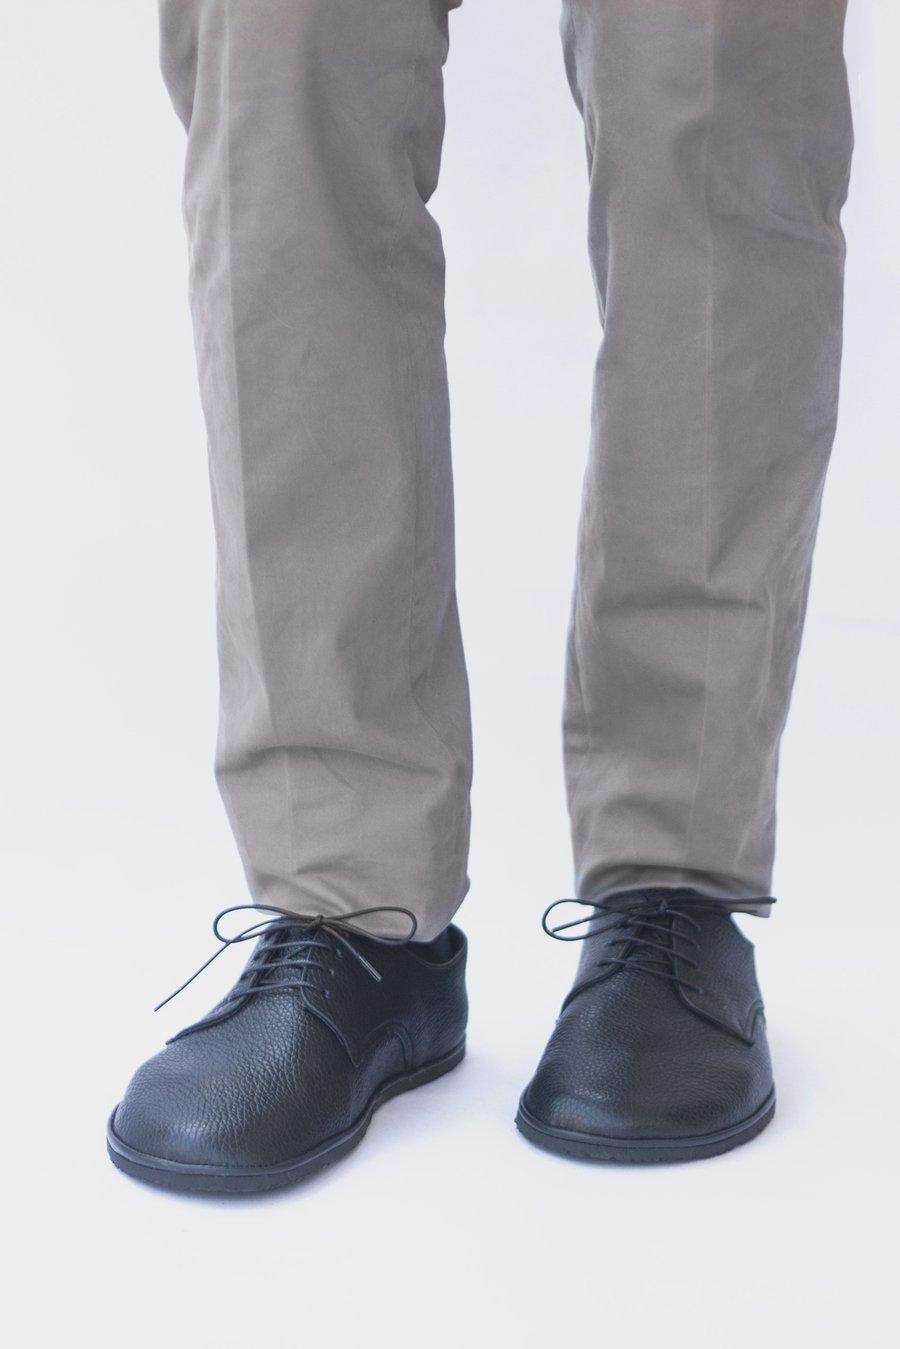 Image of Plain Toe Derby in Pebbled Black